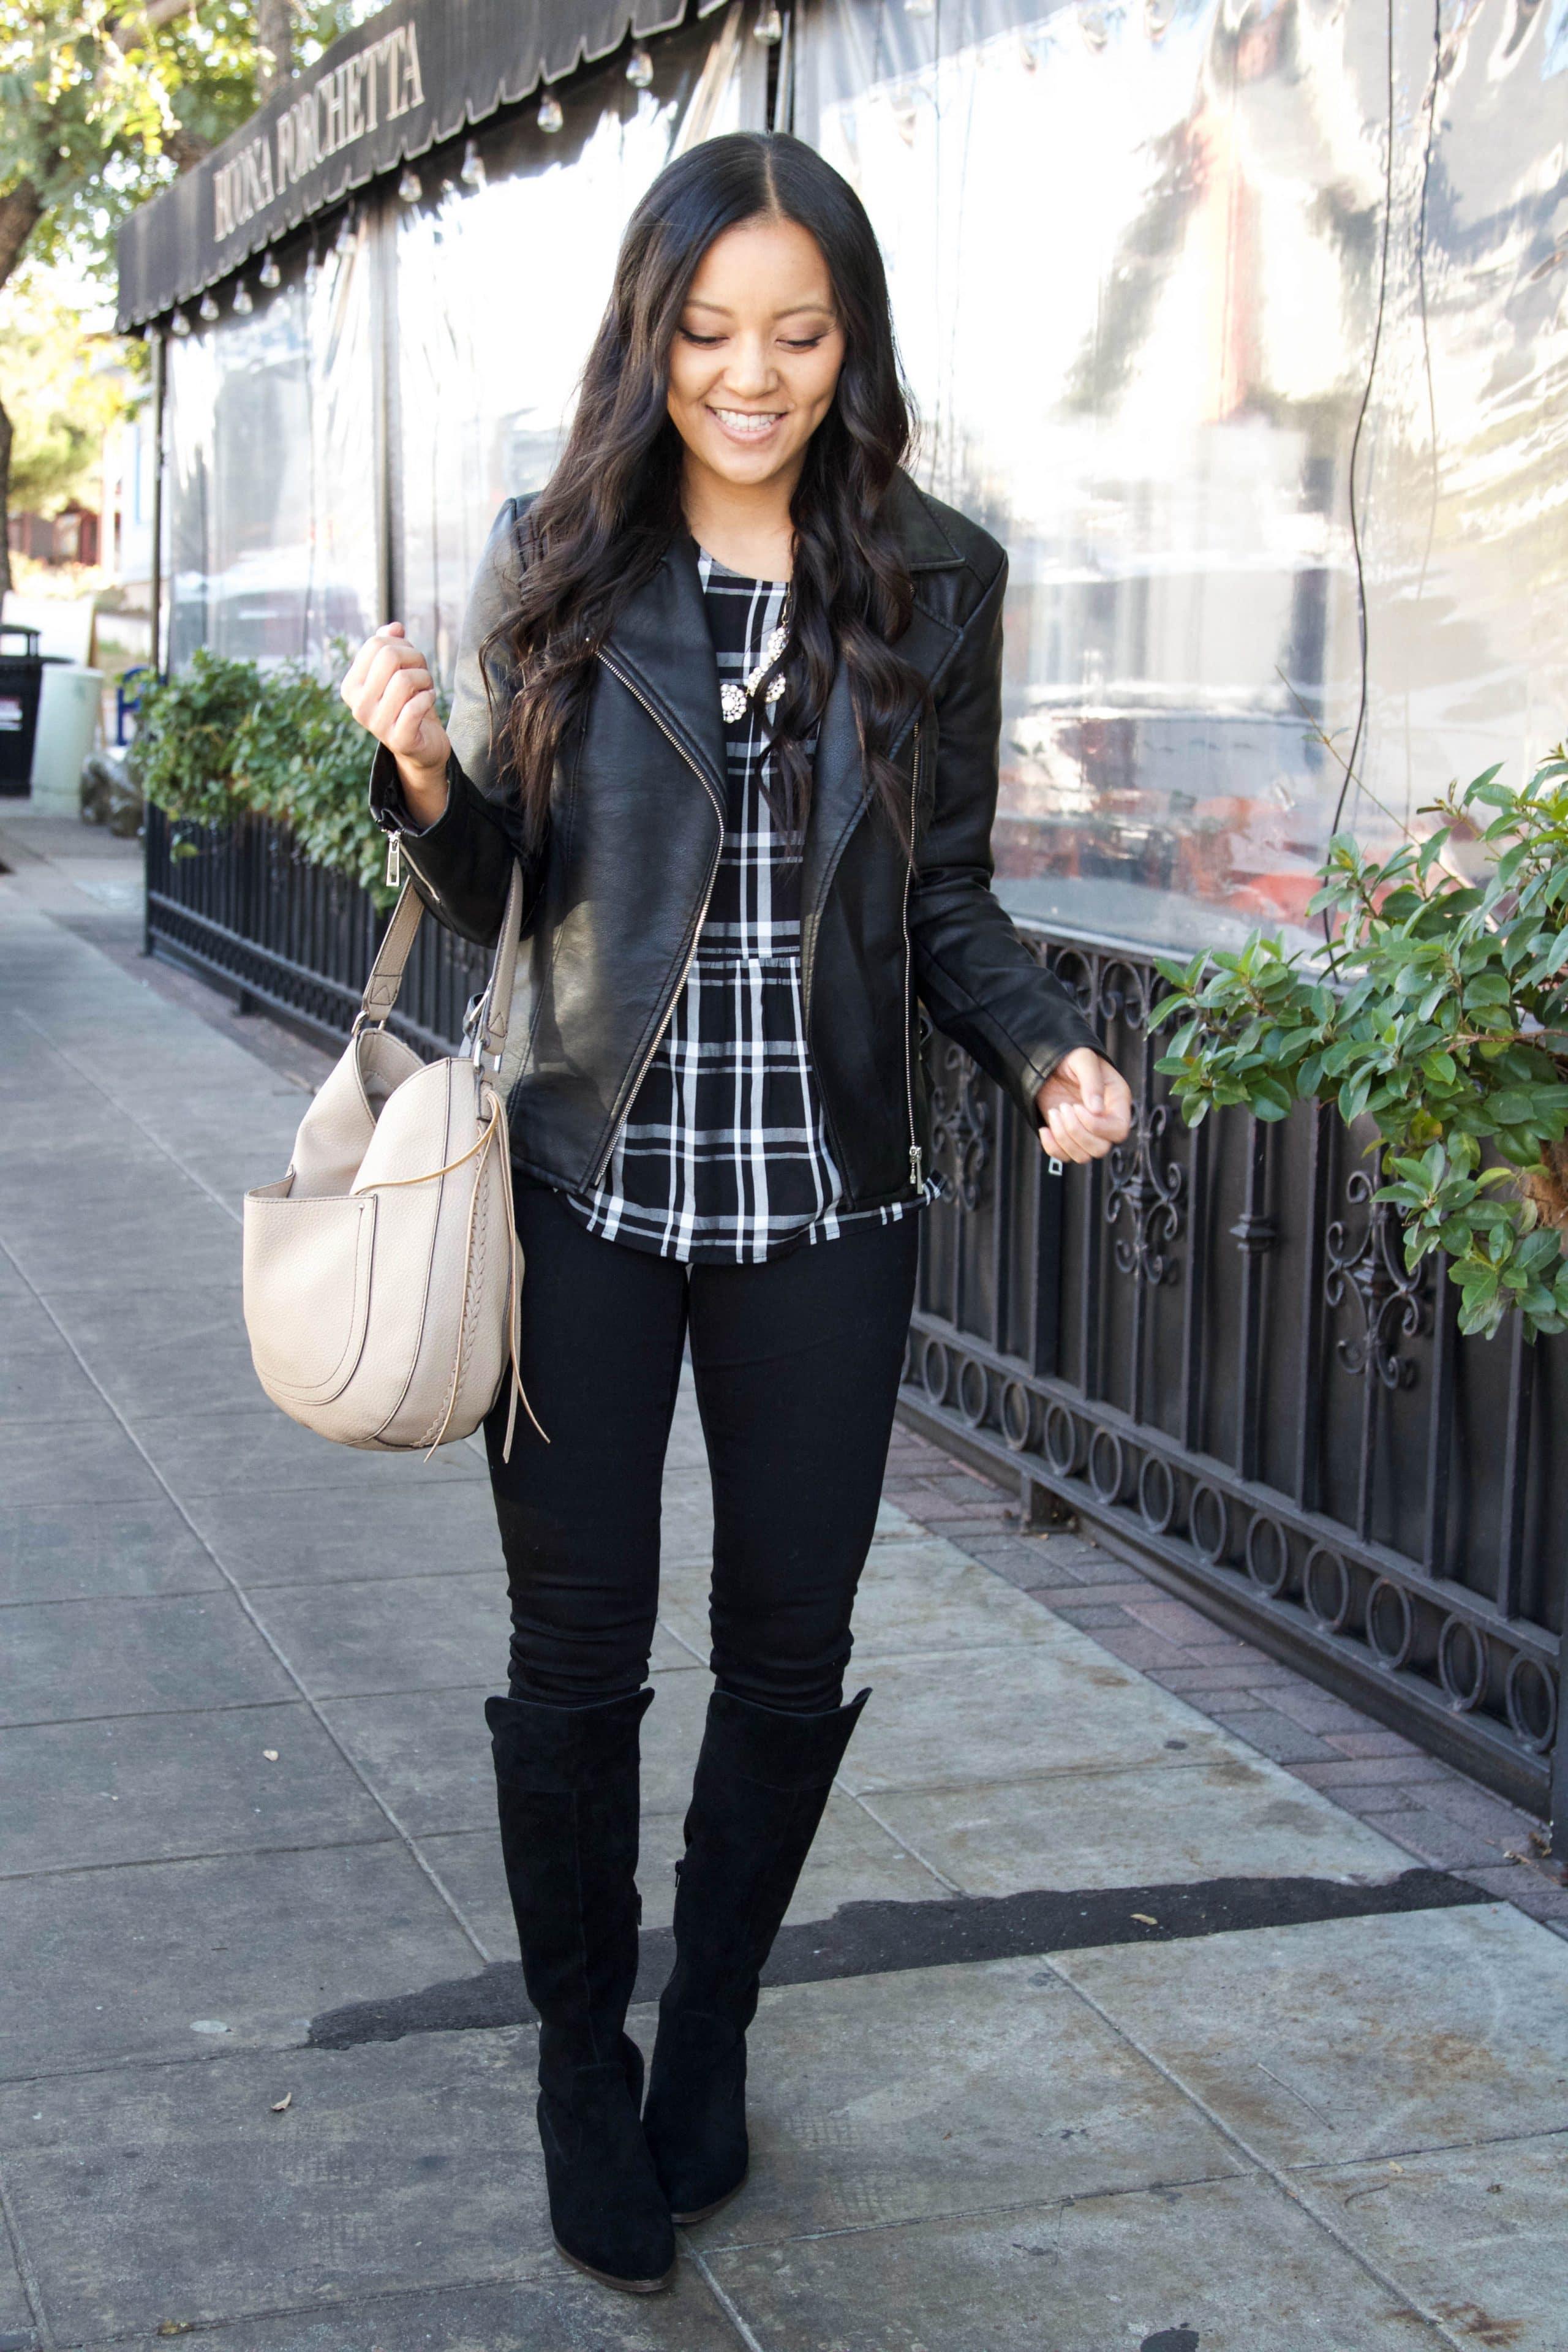 Black tall boots + tan bag + plaid top + moto jacket